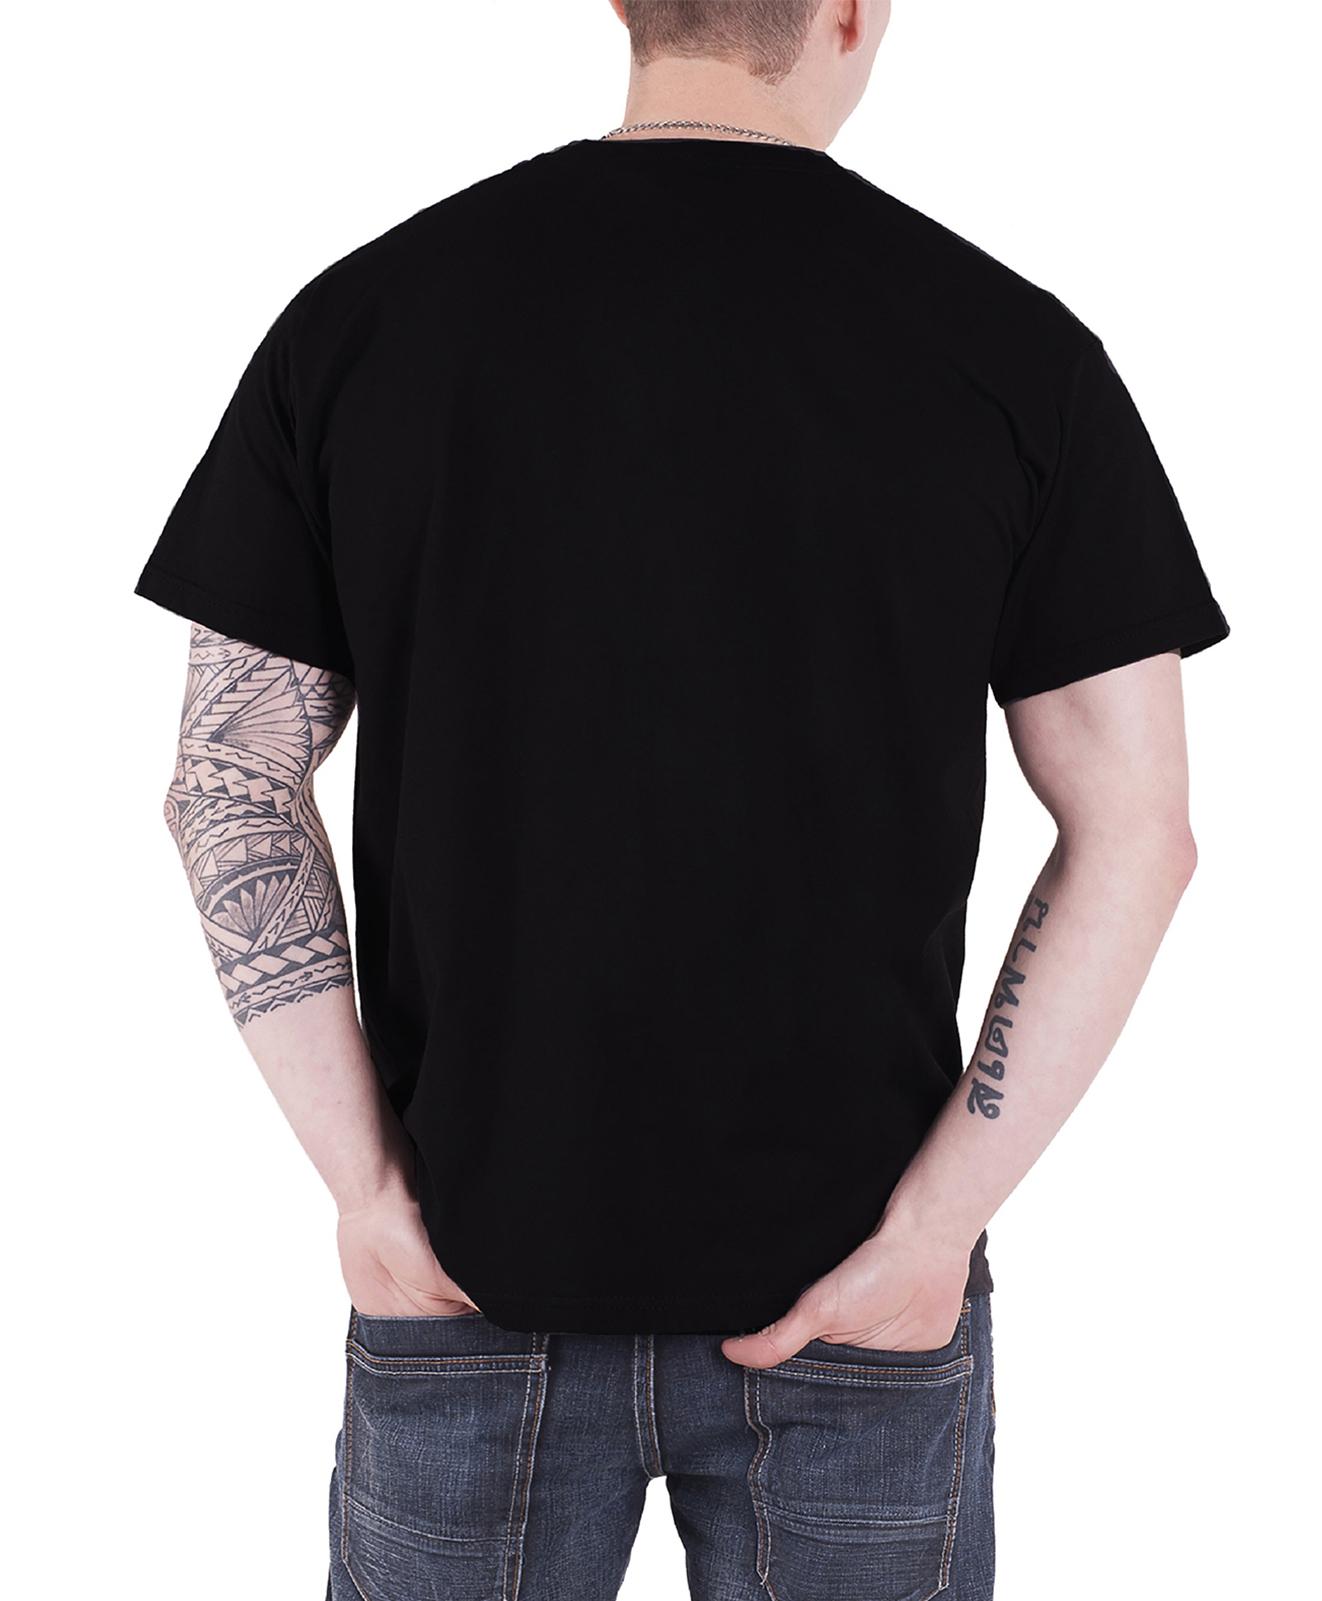 Official-Gas-Monkey-Garage-T-Shirt-Official-GMG-Logo-Kustom-Builds-new-Mens Indexbild 19